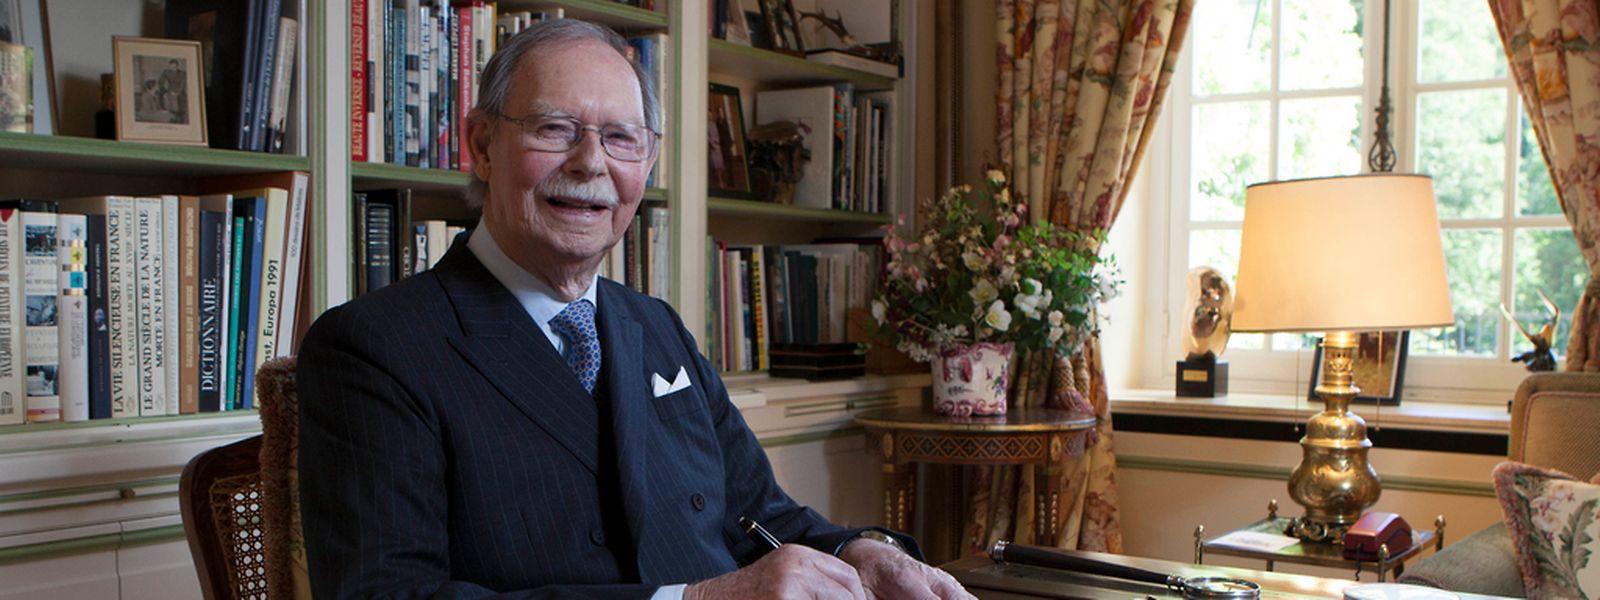 Großherzog Jean wurde am 5. Januar 1921 auf Schloss Berg geboren.